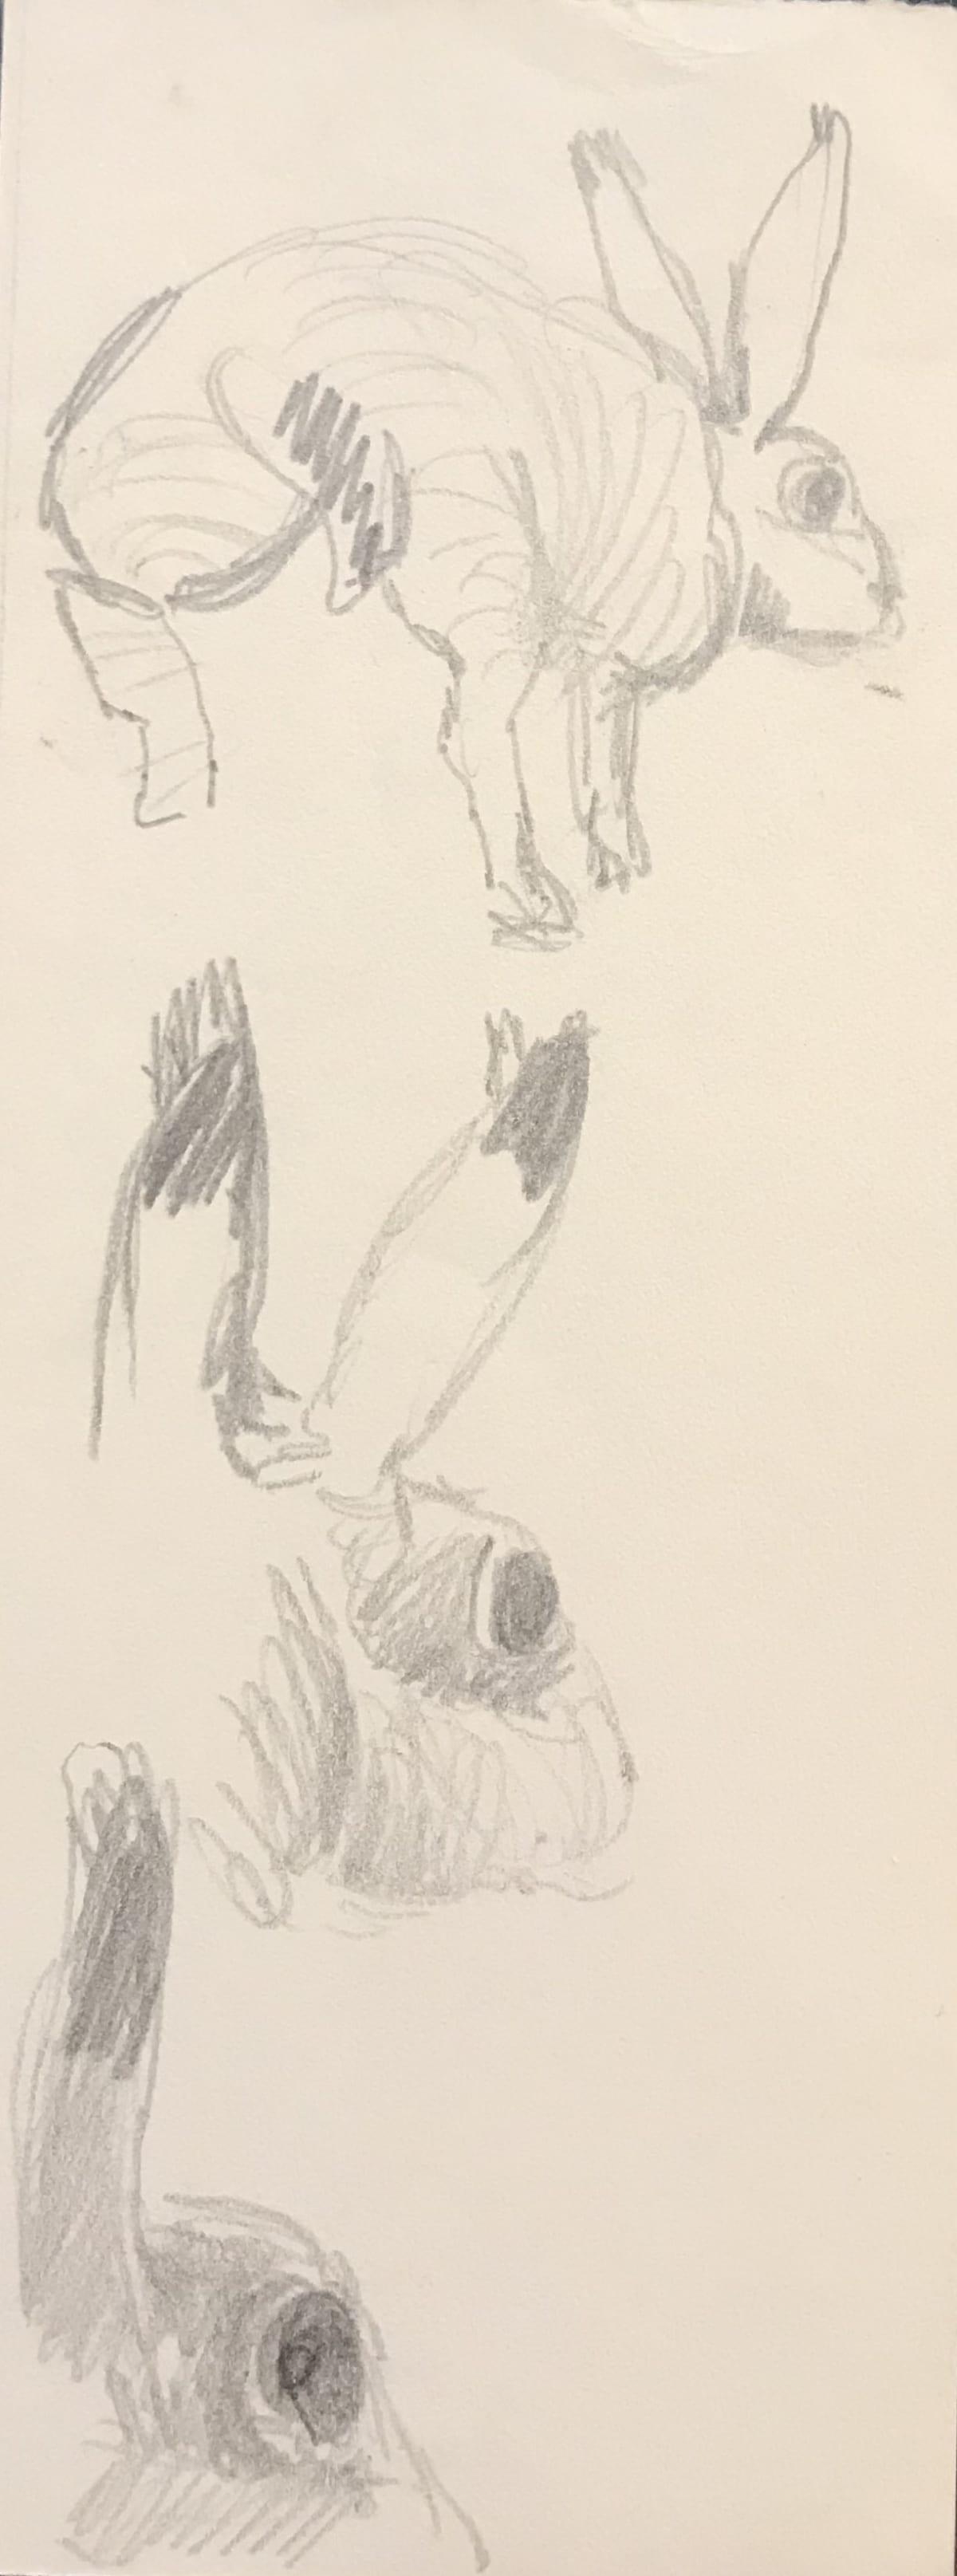 Mary Newcomb, Rabbit Study